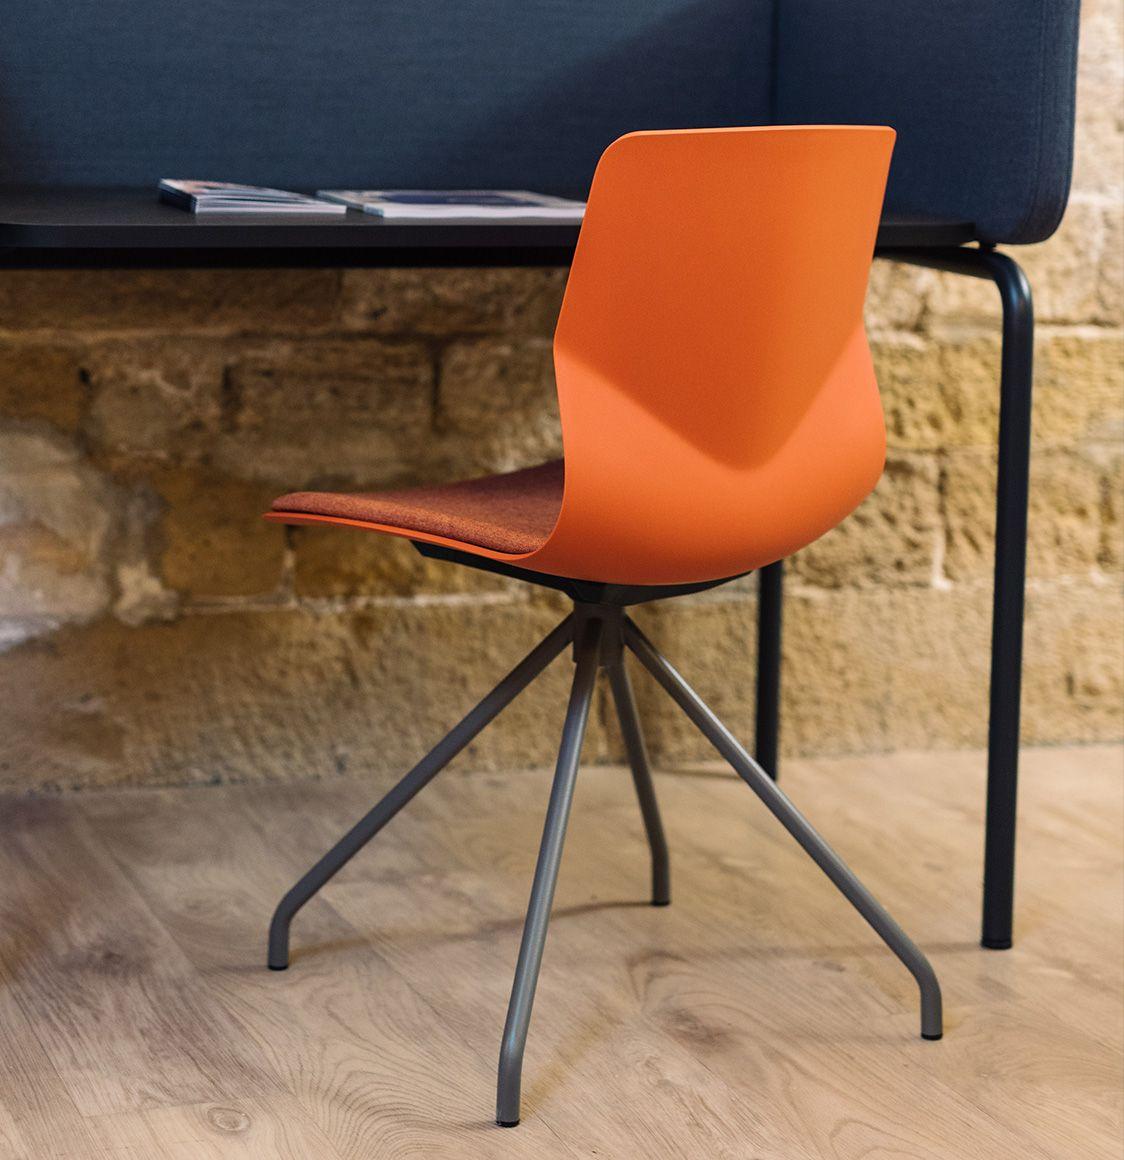 Hightower Foursure11 Office Design Interiordesign Officedesign